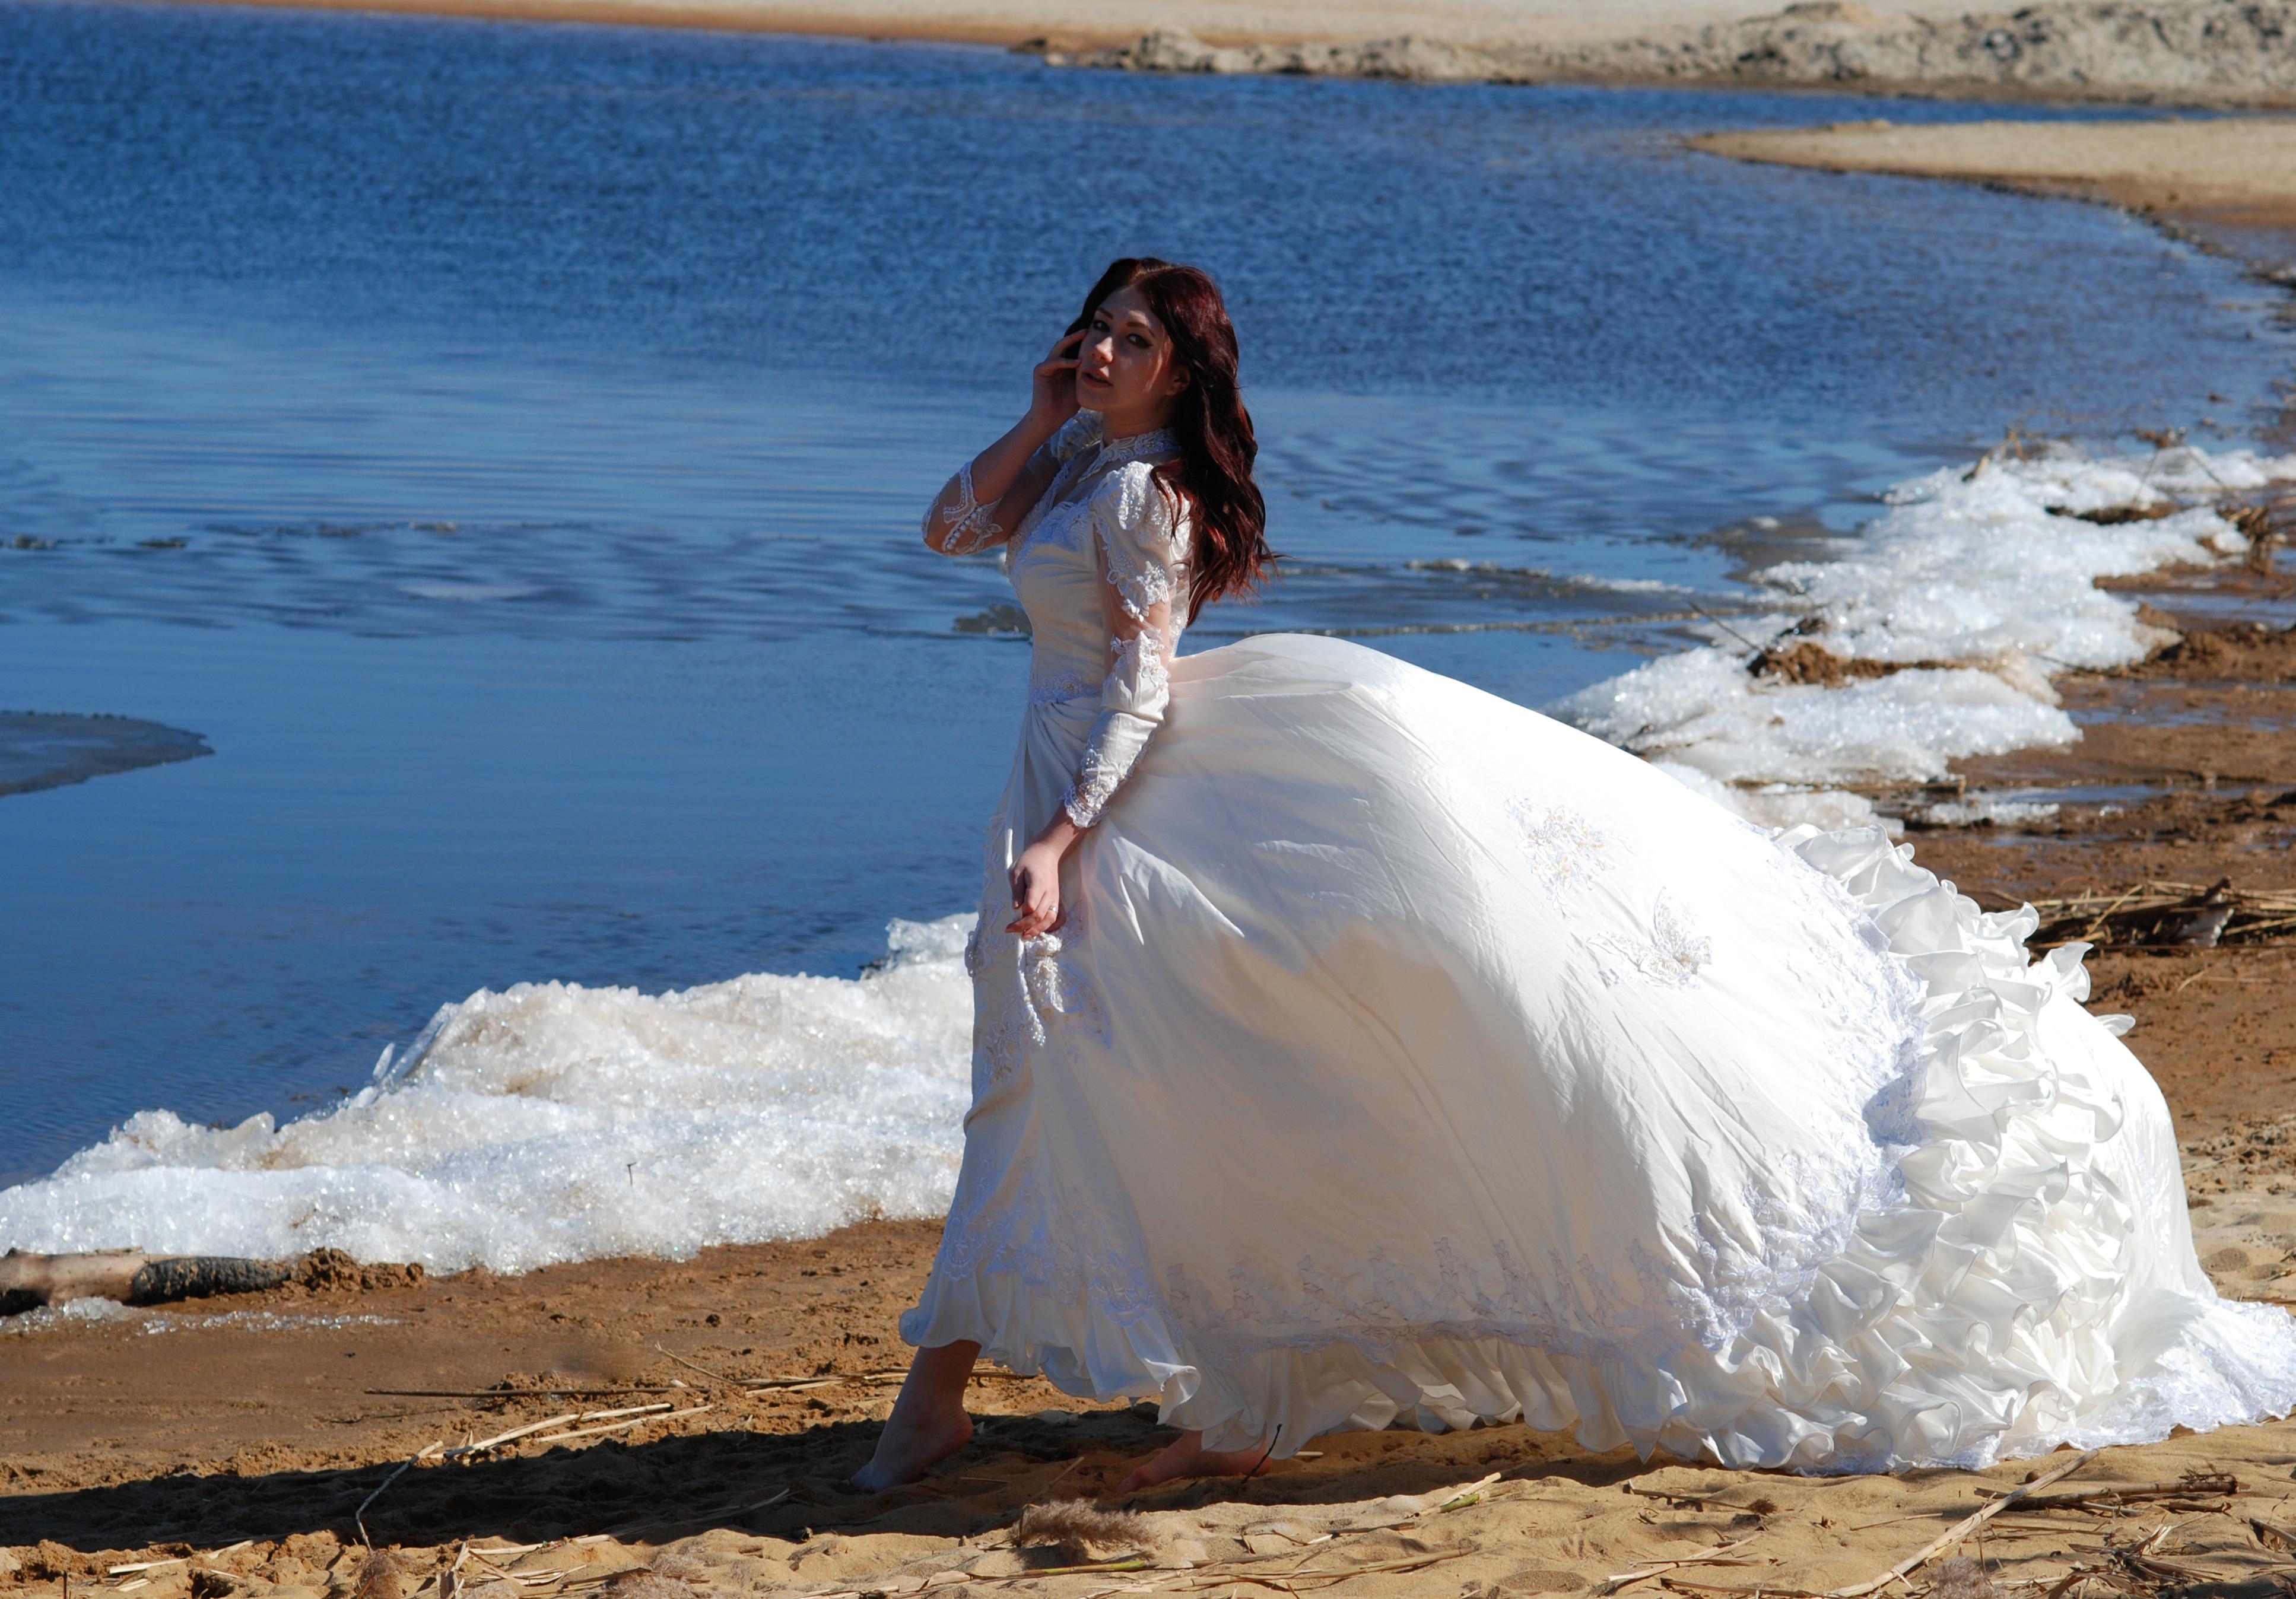 Wind on the beach_1 by anastasiya-landa